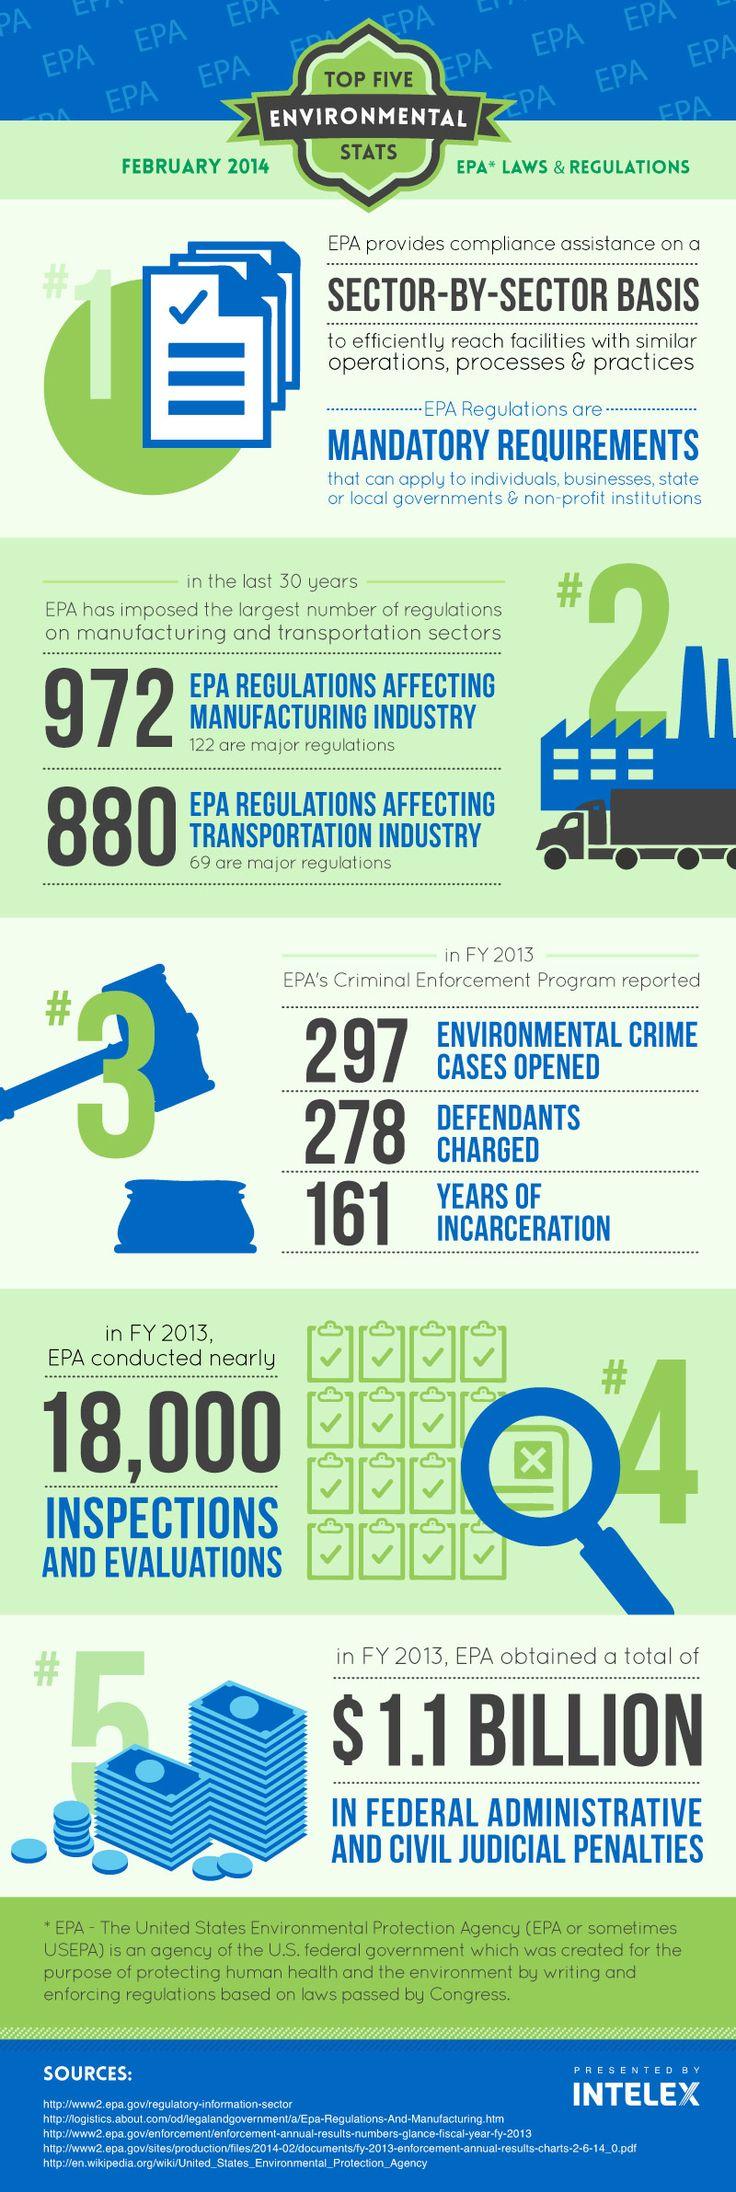 Intelex Top 5 Environmental Statistics EPA Laws